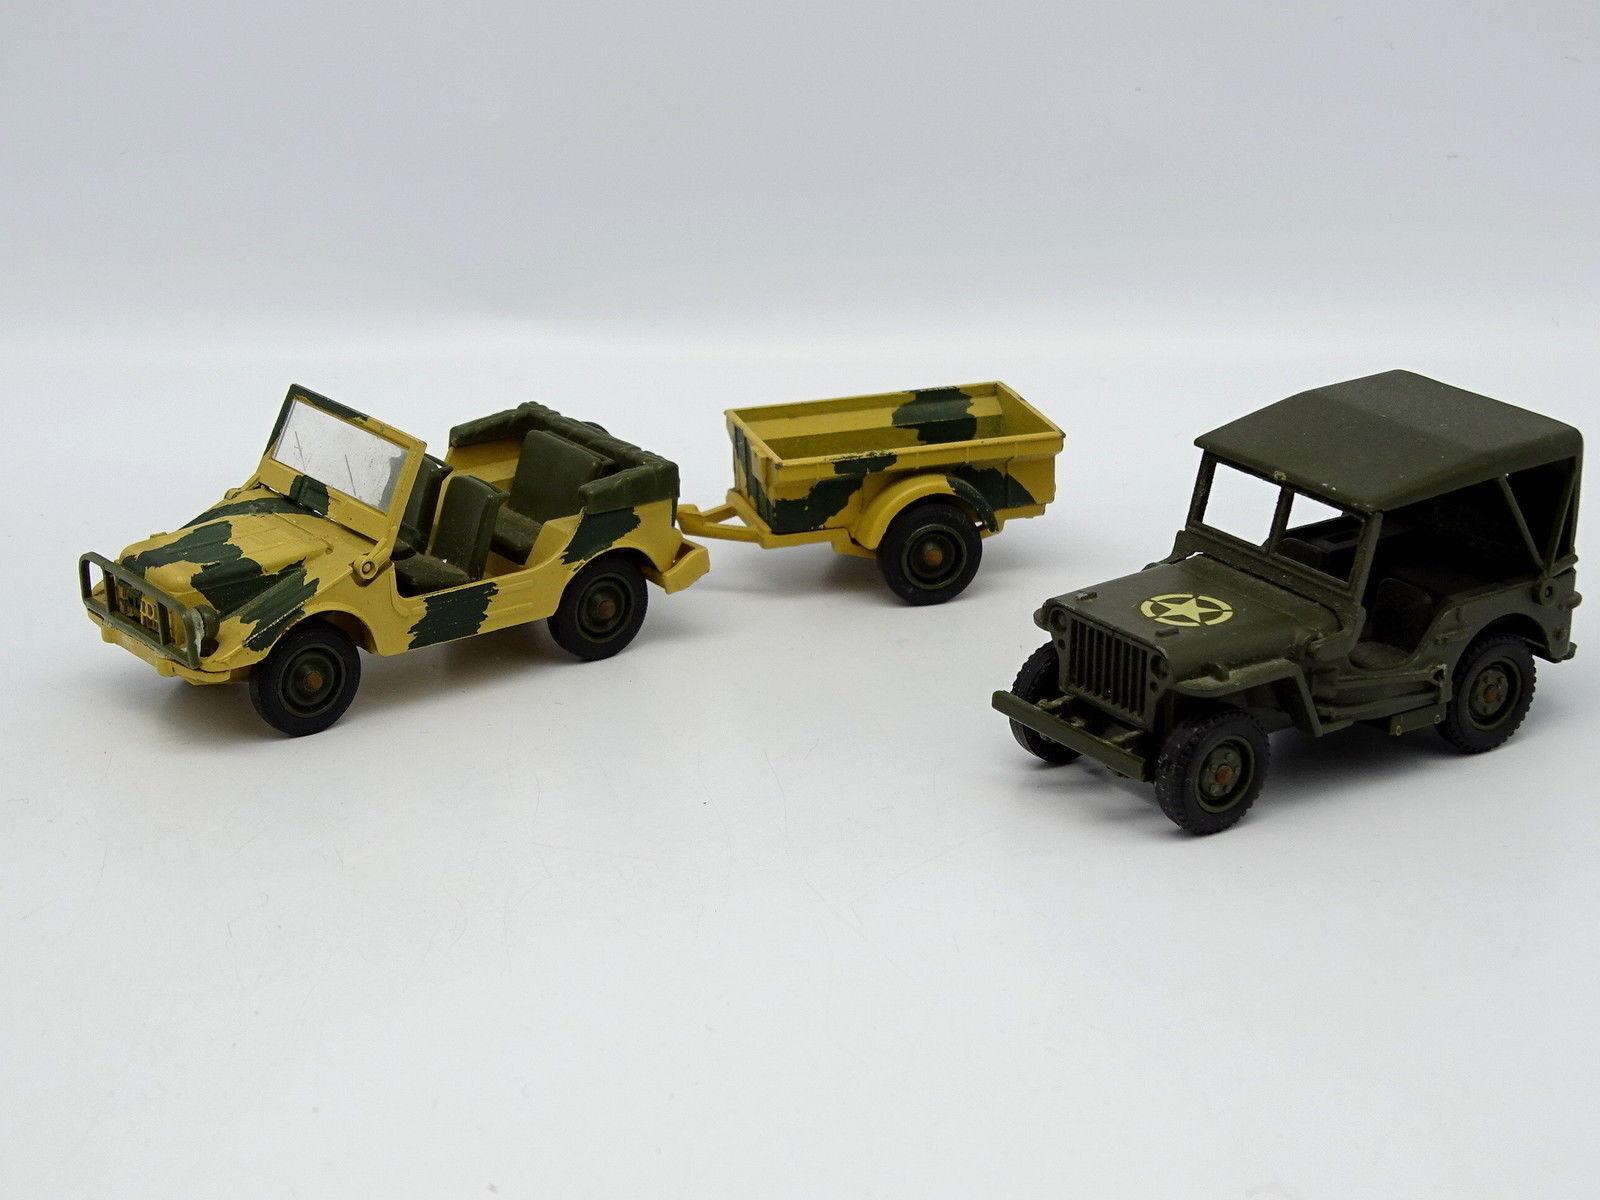 Solido Militär Armee Sb 1 43 - 2er Satz Jeep Willys + Auto Verbindung